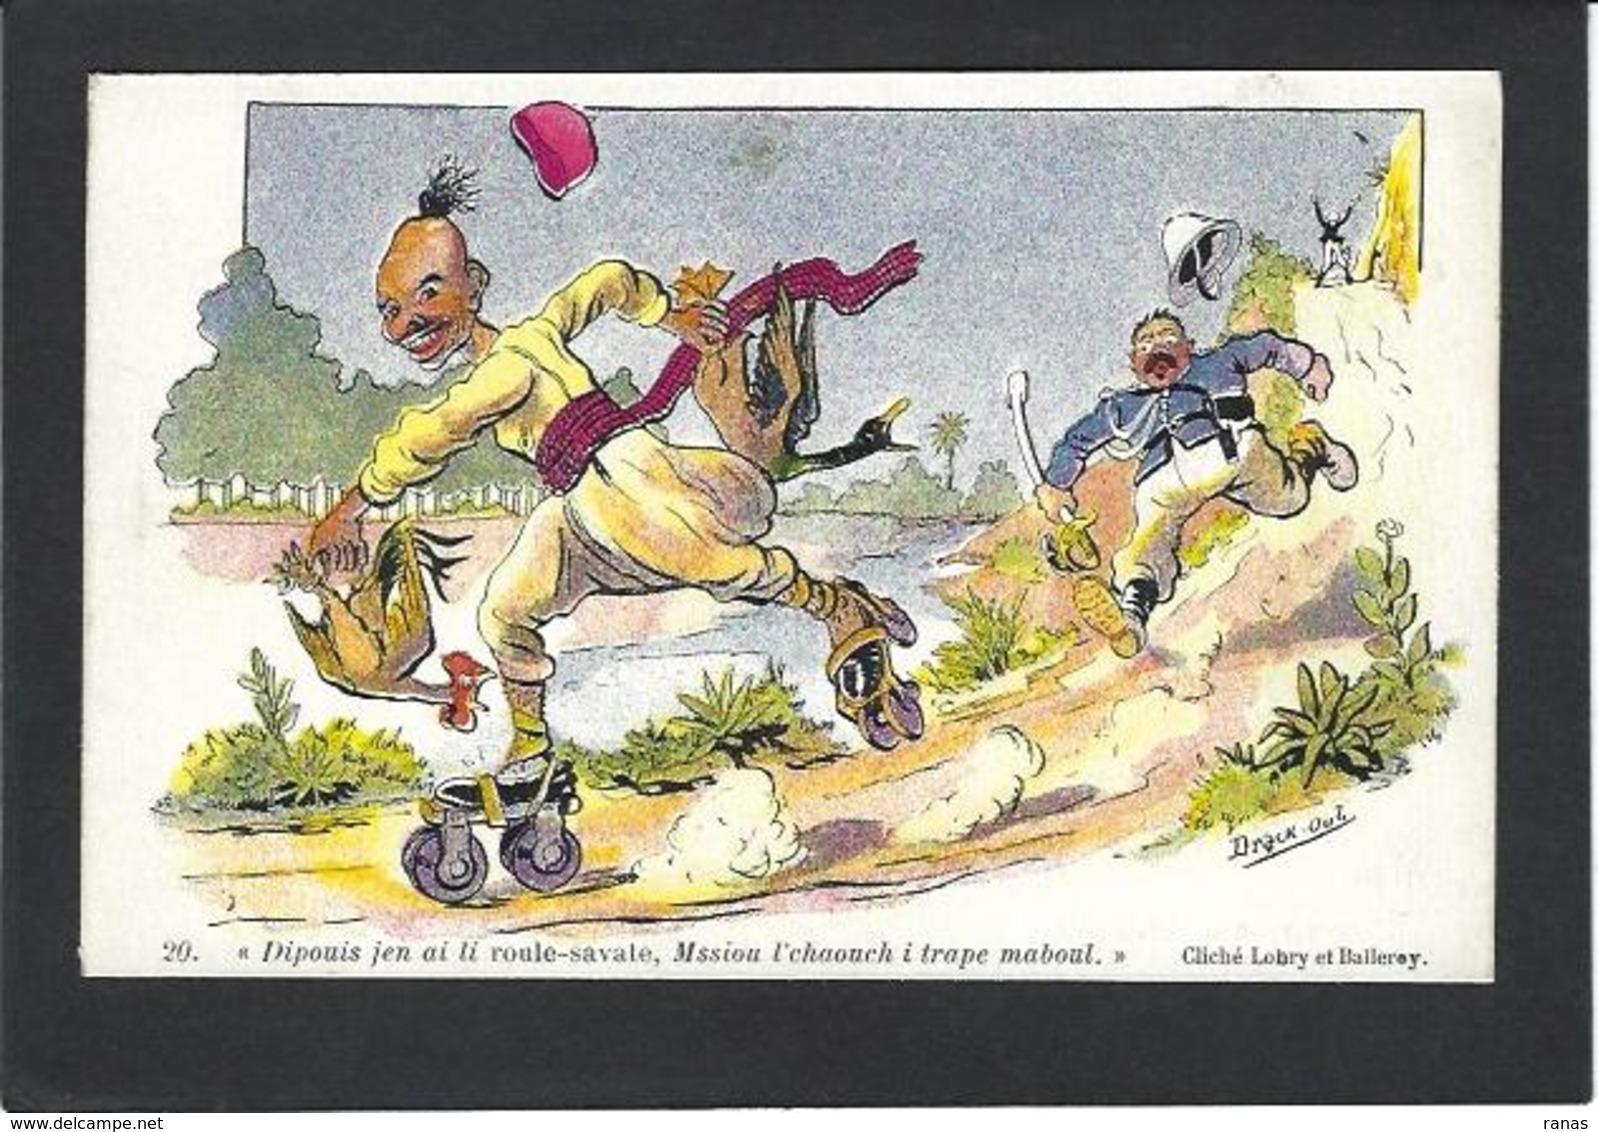 CPA Drack Oub Type CHAGNY Illustrateur Arabe Algerie écrite Patin à Roulettes Skating Roller - Künstlerkarten